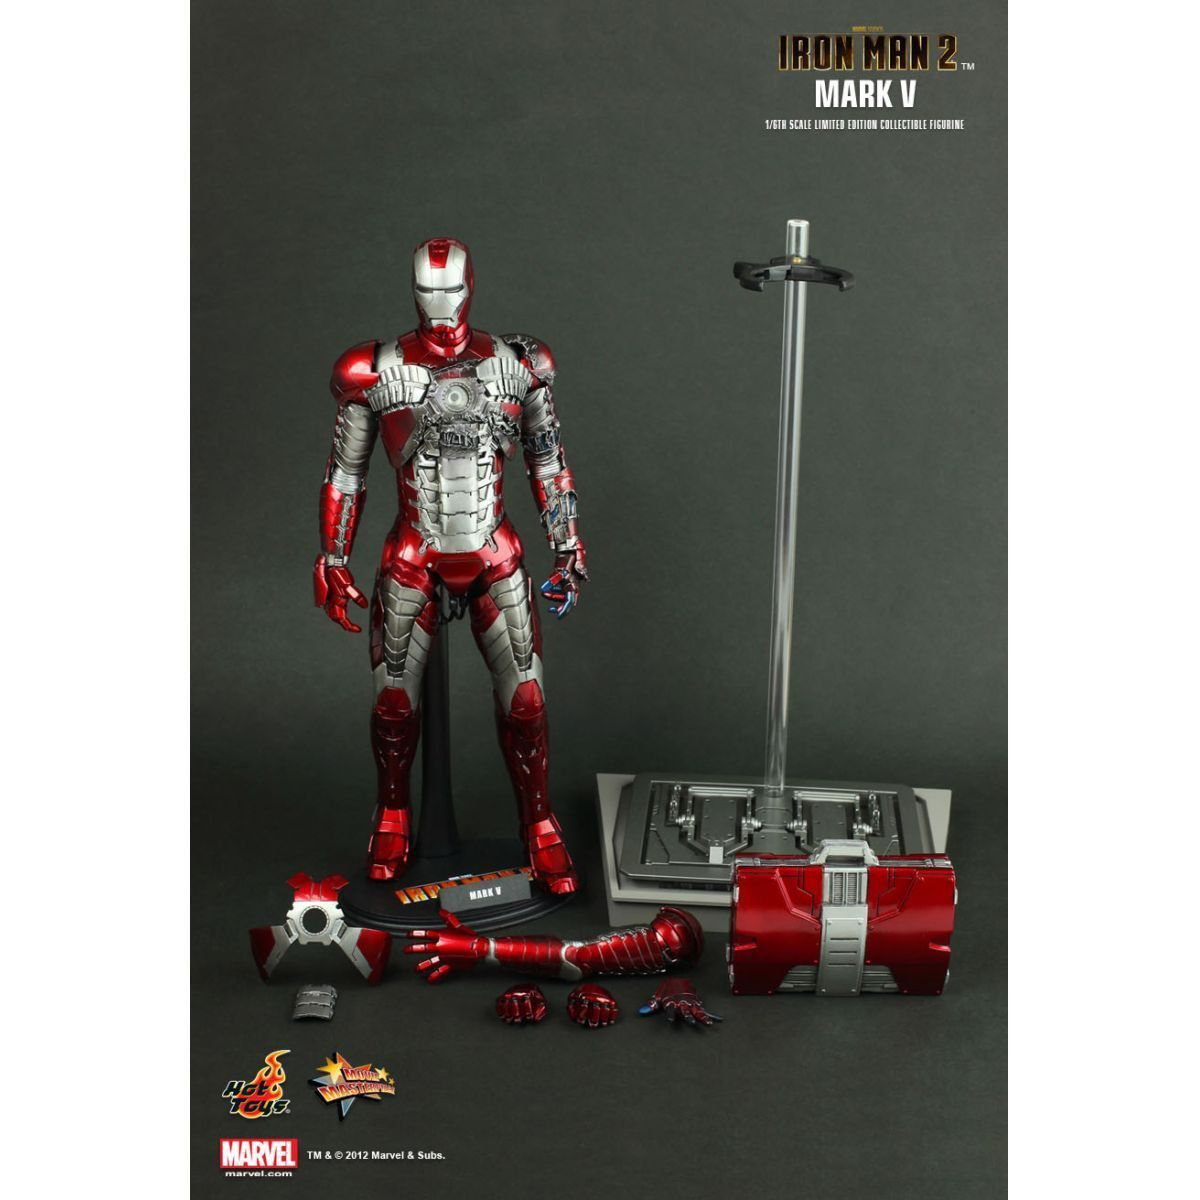 Action Figure Homem de Ferro (Iron Man) Mark V: Homem de Ferro 2 (Iron Man 2) Escala 1/6 (MMS145) - Hot Toys